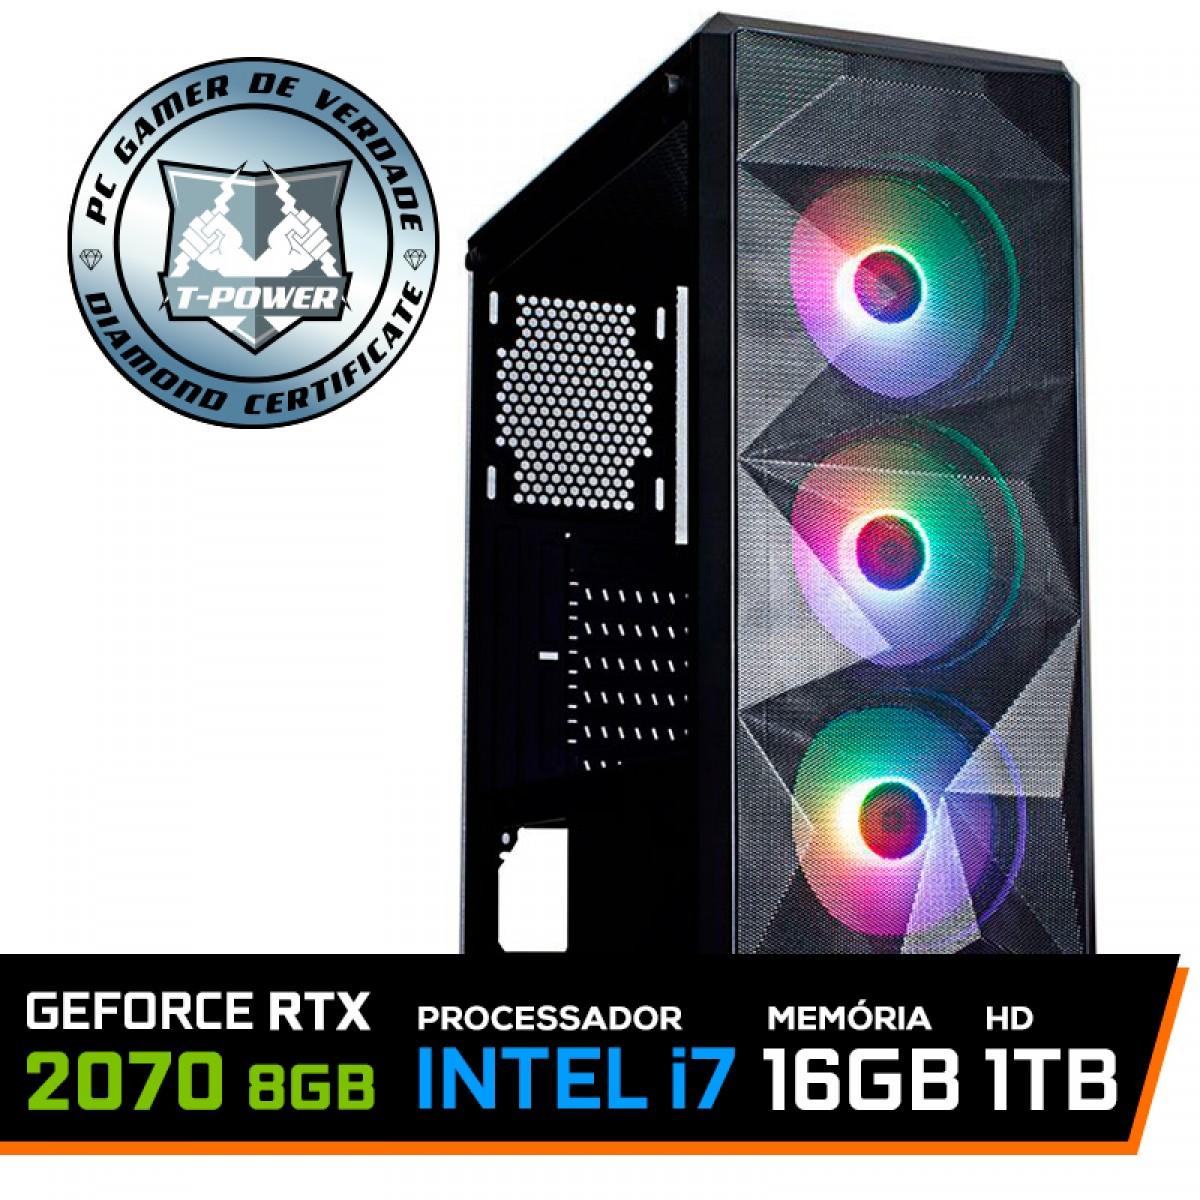 Pc Gamer T-Power Strong Lvl-7 ntel Core i7 10700 / GeForce RTX 2070 / DDR4 16GB / HD 1TB / 600W